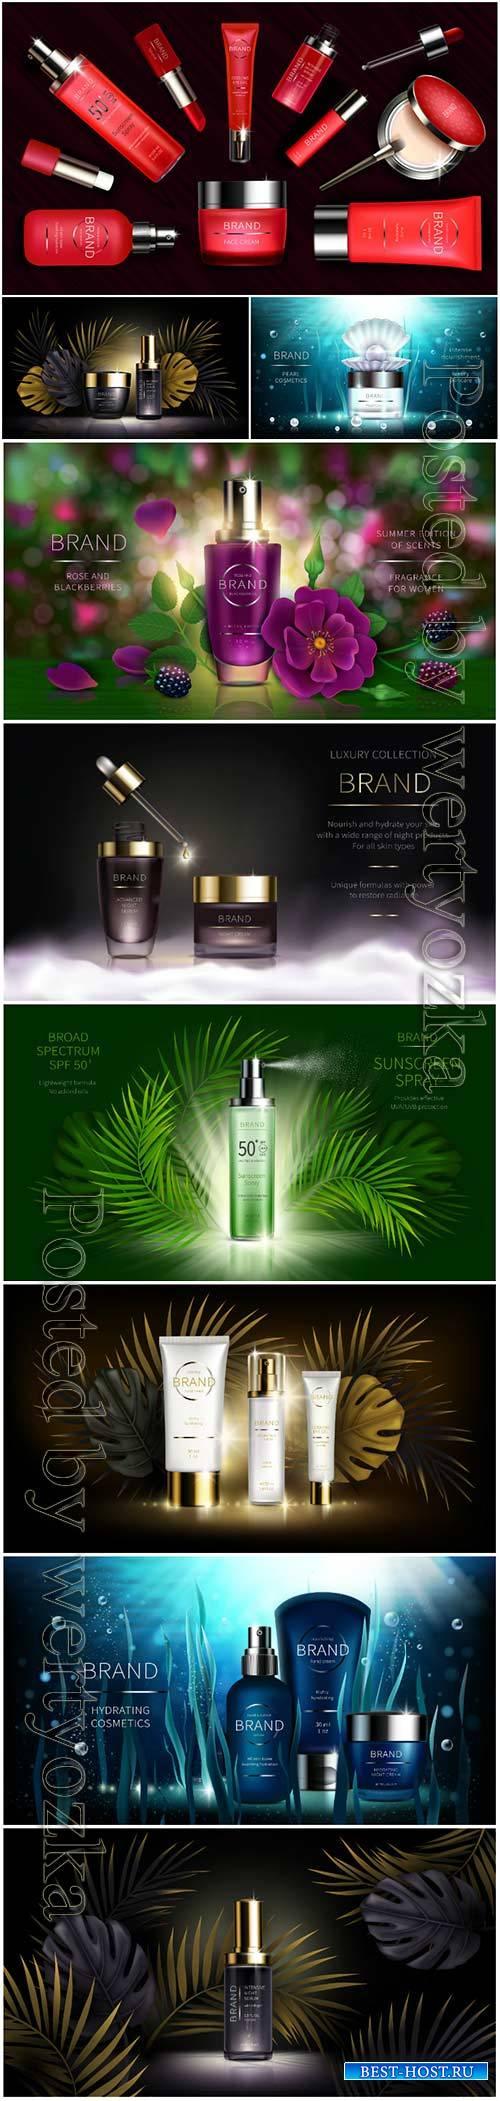 Skin care cosmetics, vector illustration